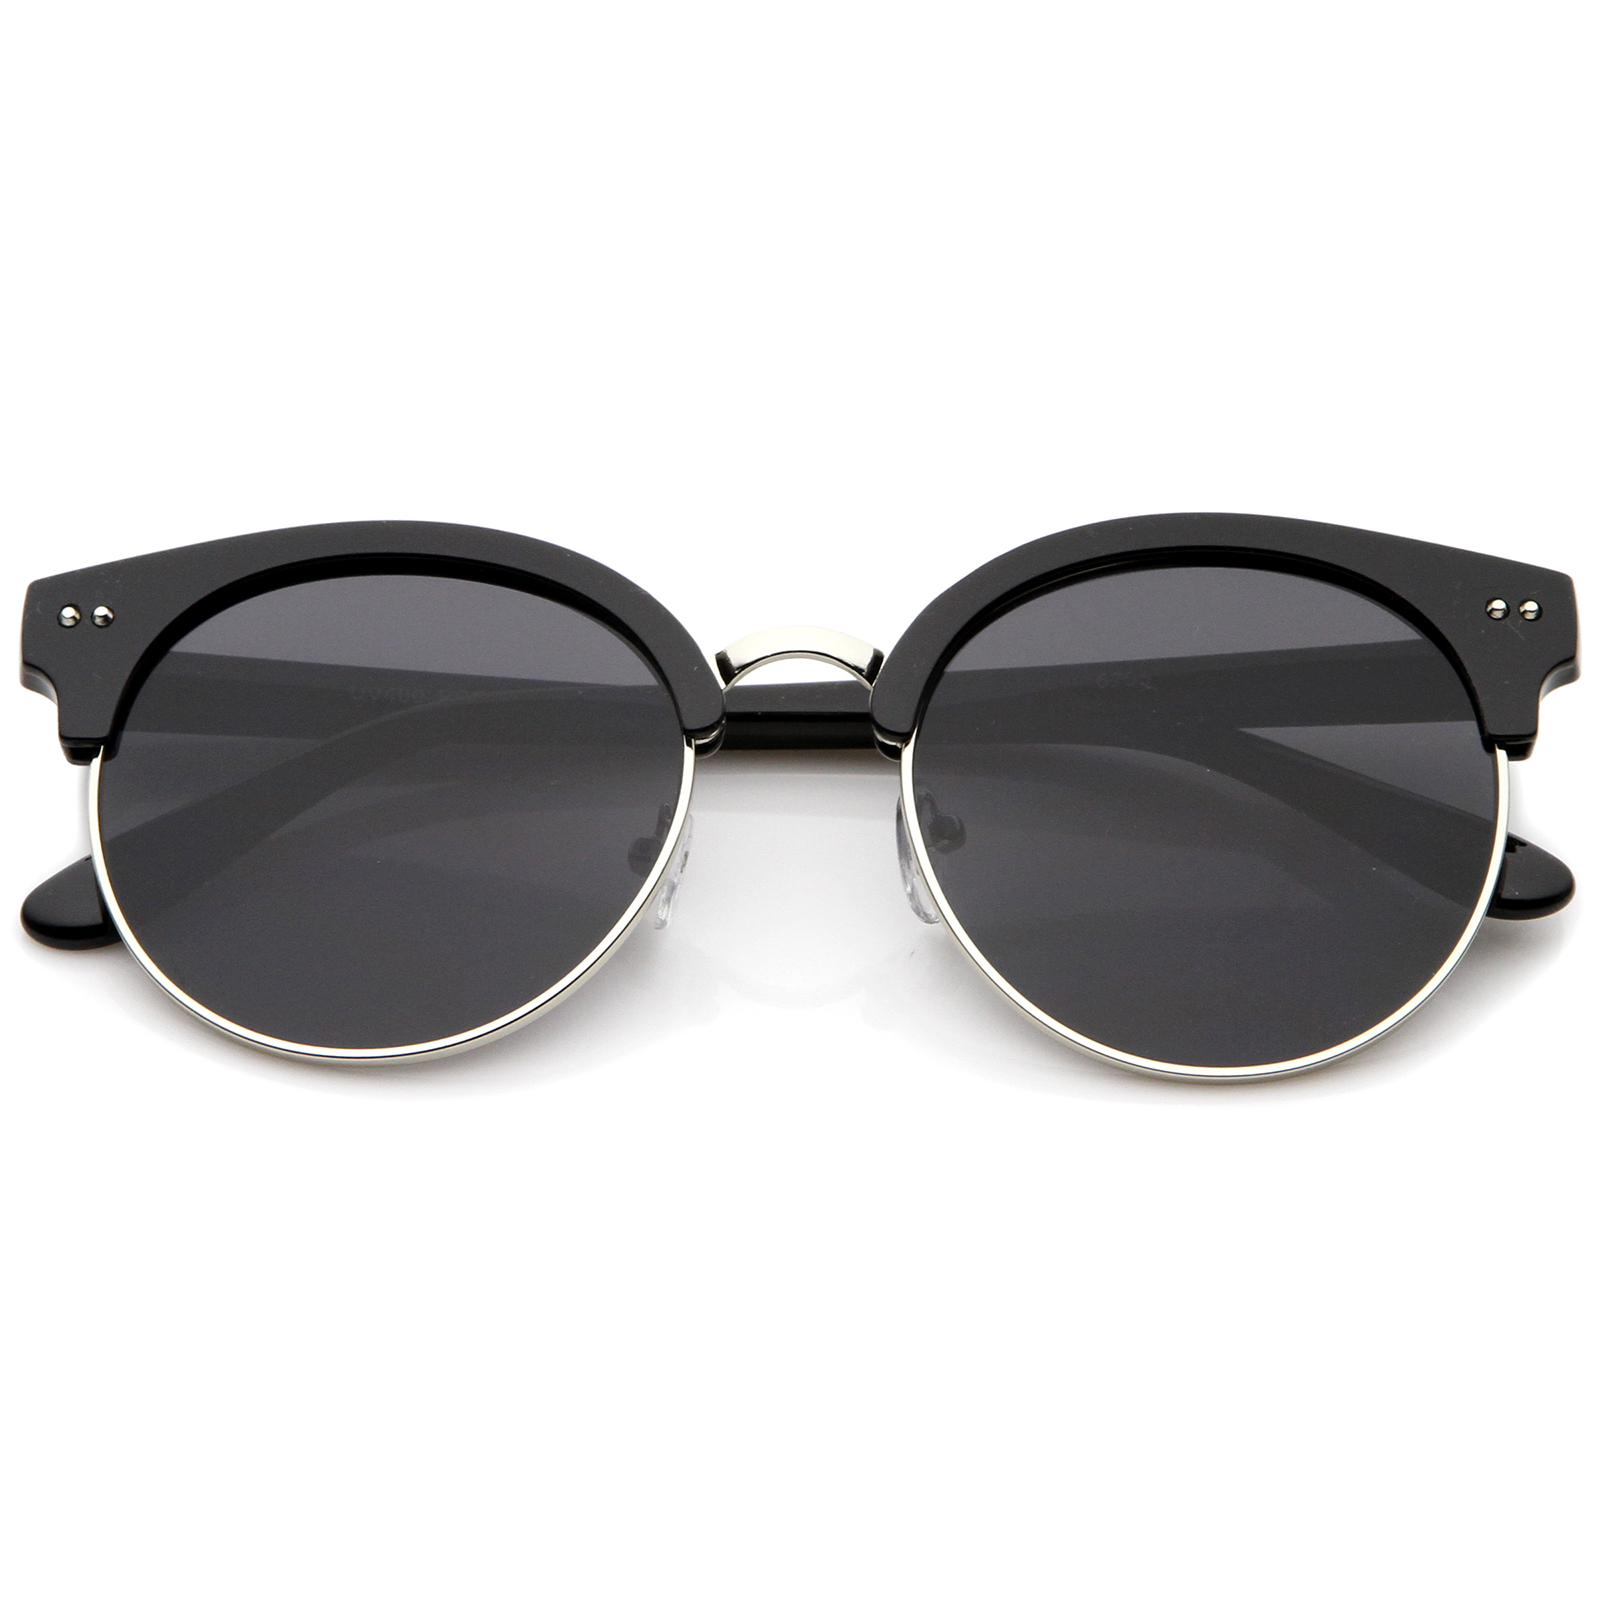 Half Frame Round Eyeglasses : sunglassLA Womens Oversize Half Frame Color Mirror Flat ...